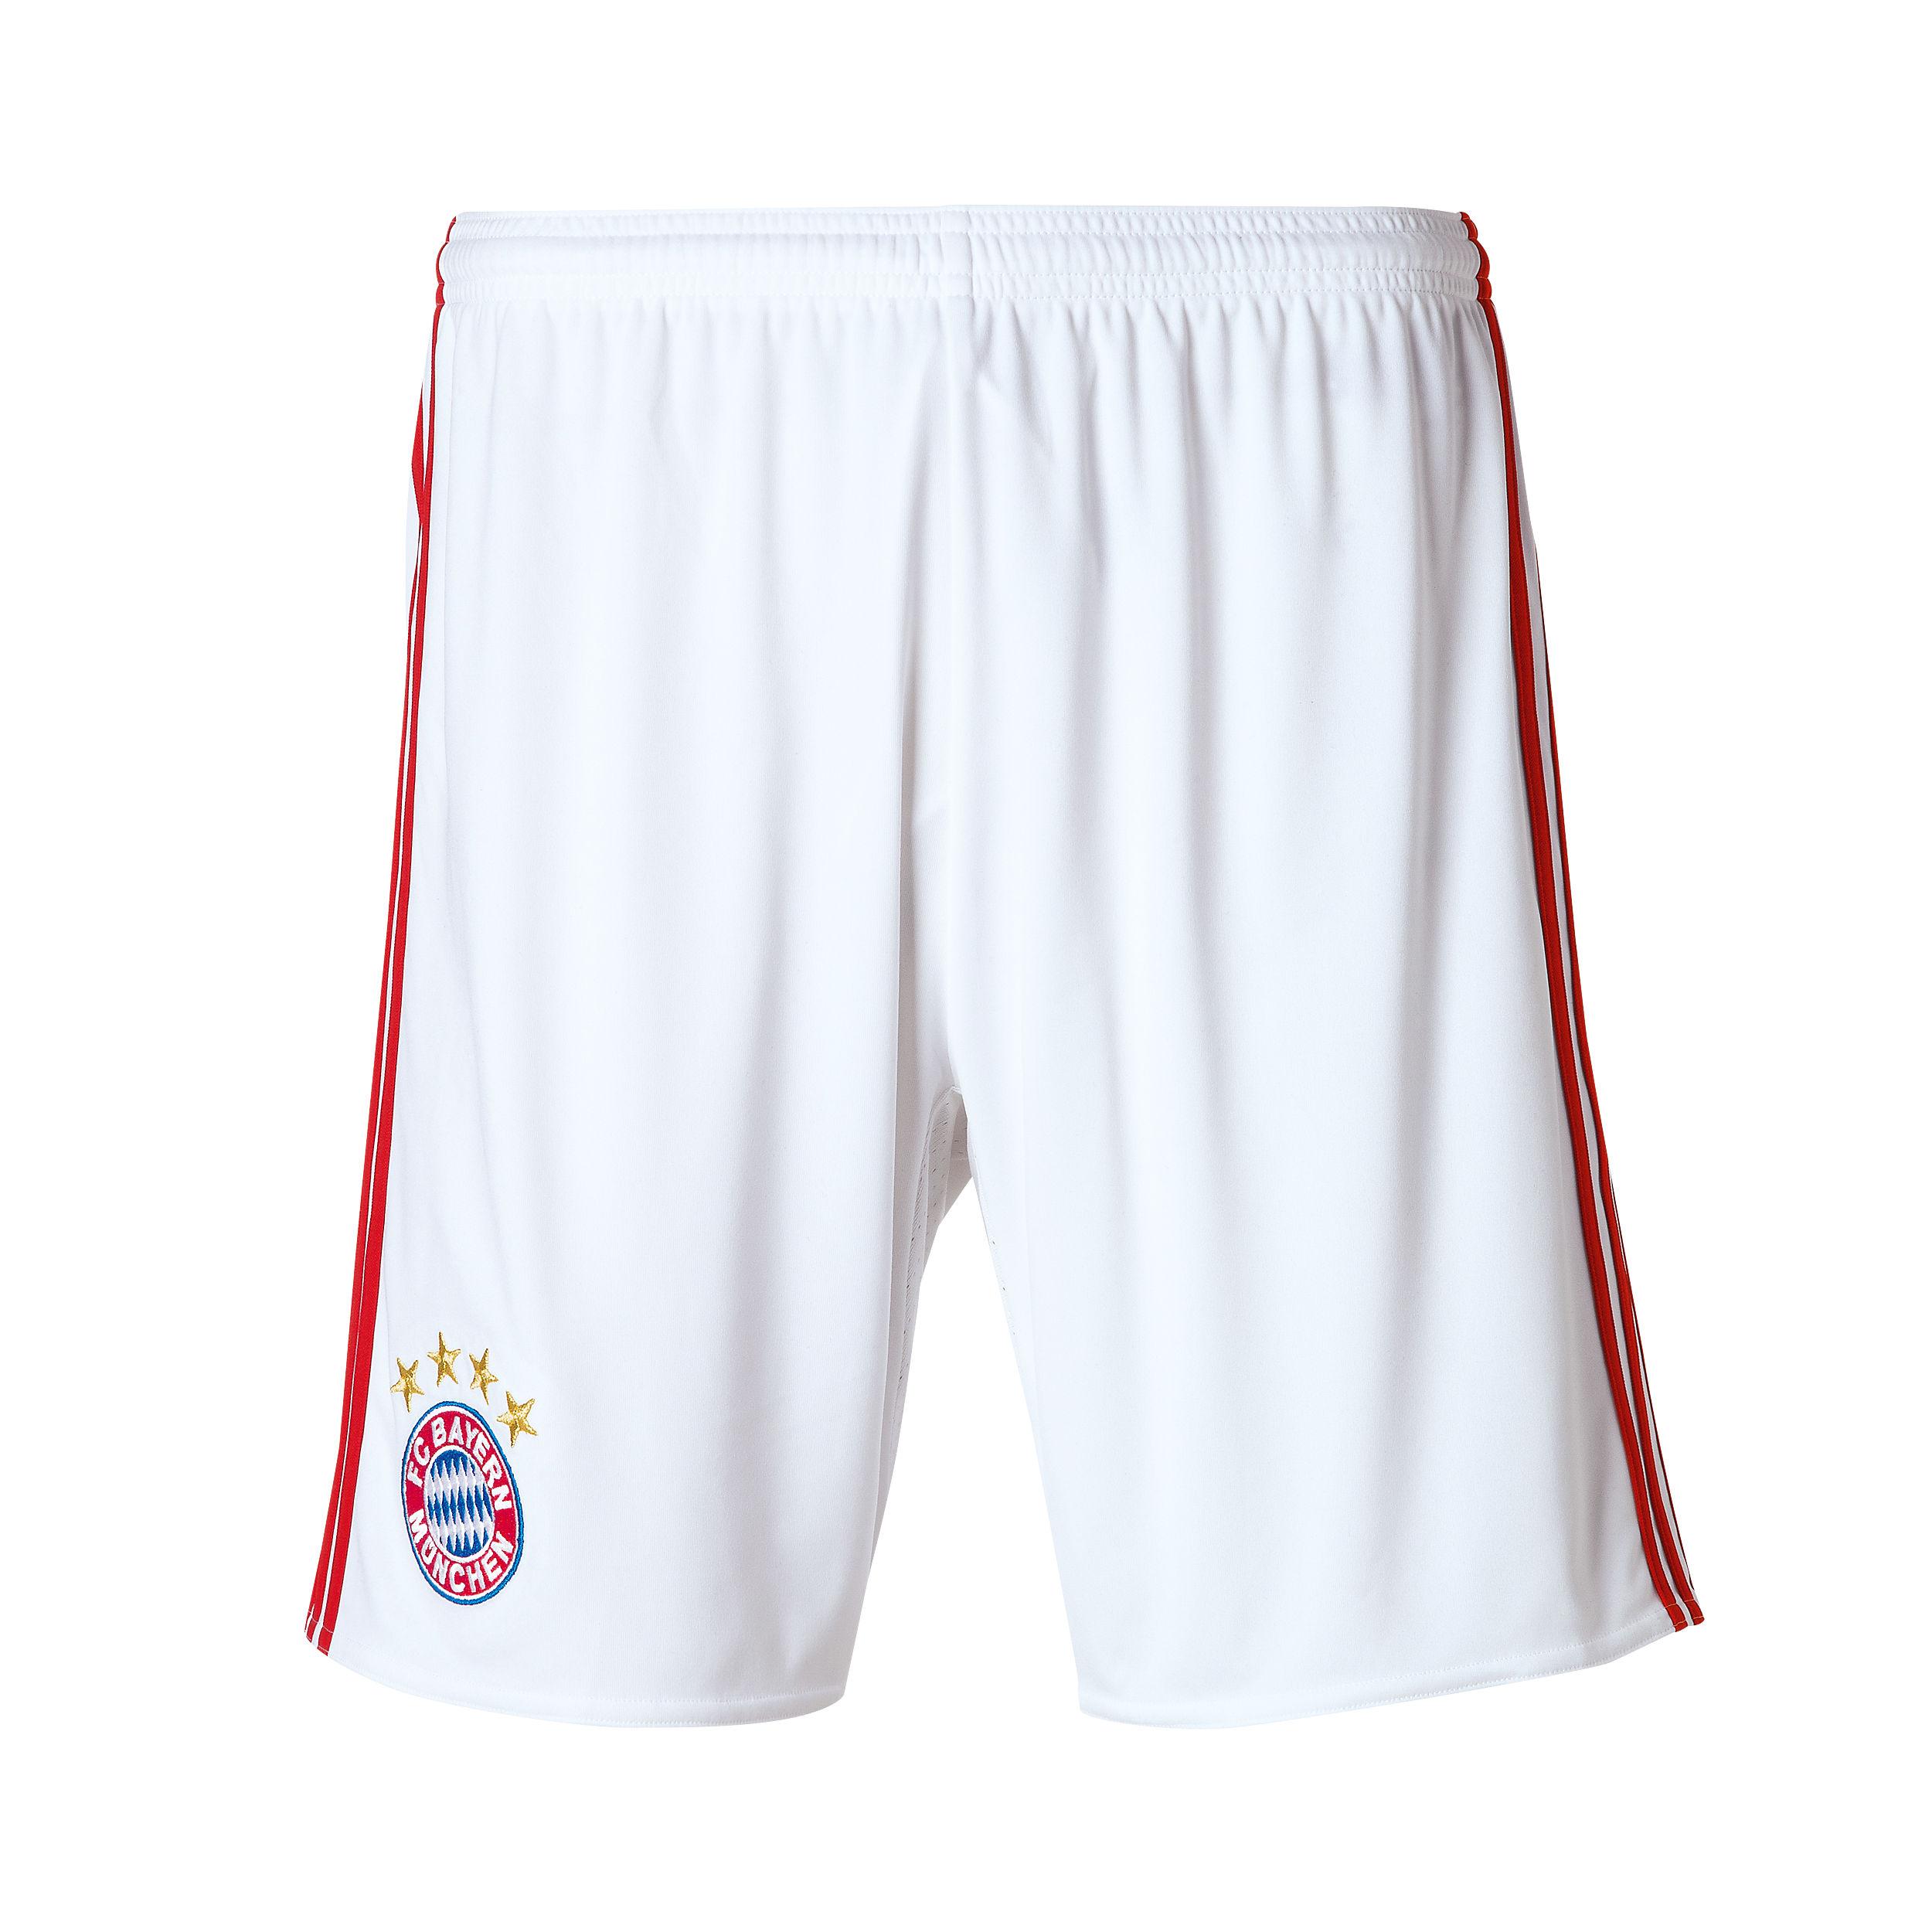 Kinder FC Bayern Short Champions League 2017/18